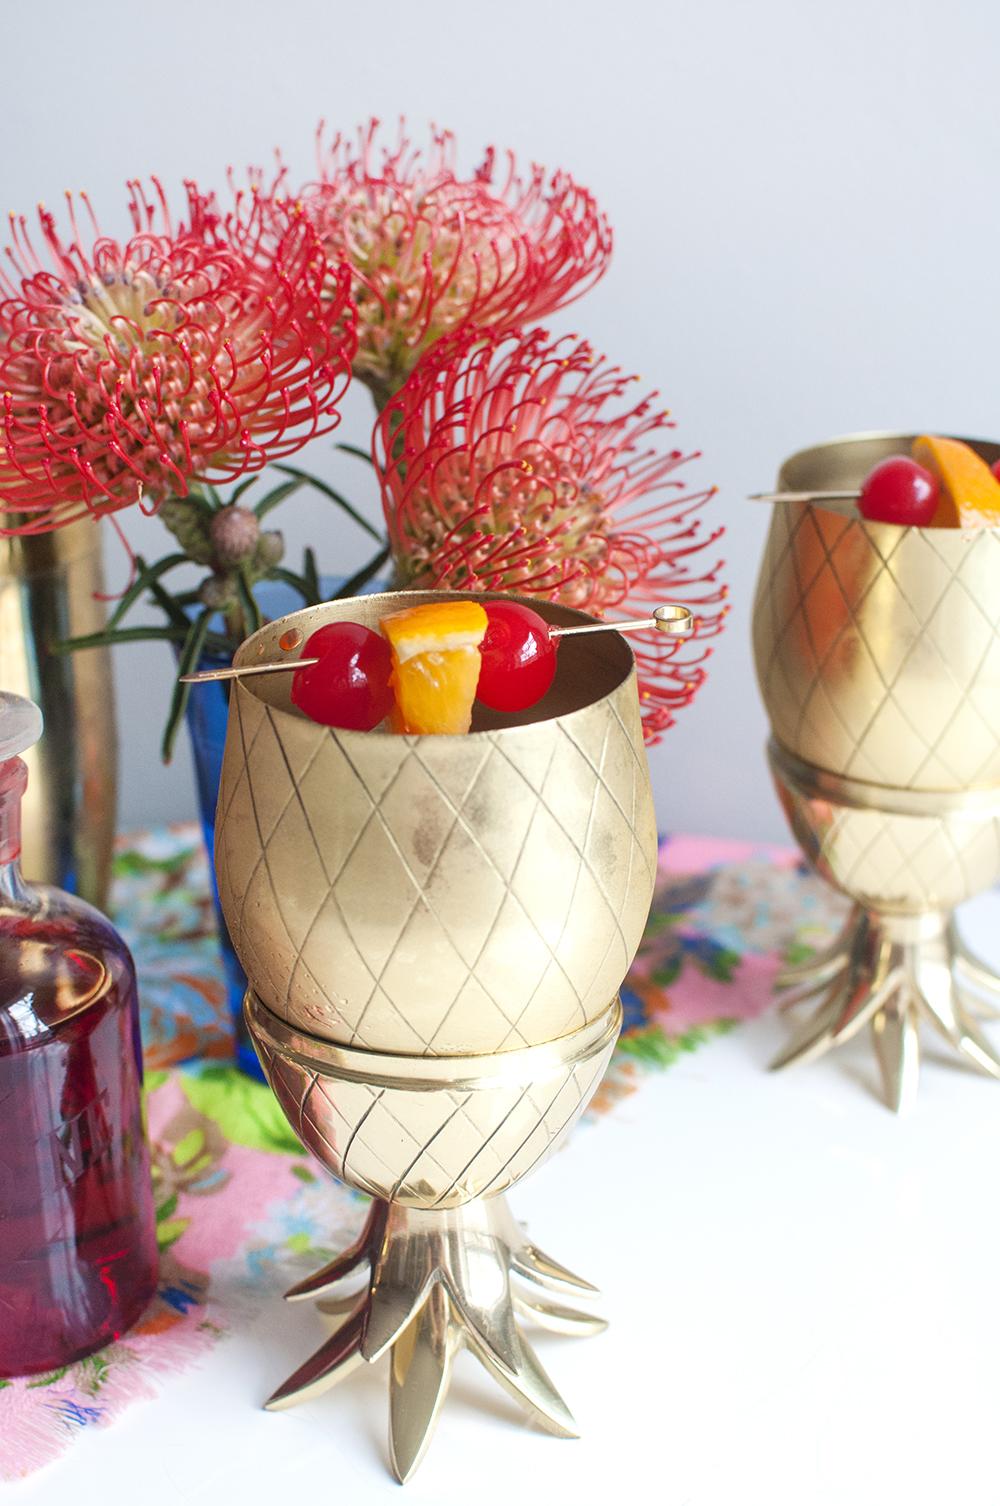 Tiki Drinks and the Pinapple Tumbler